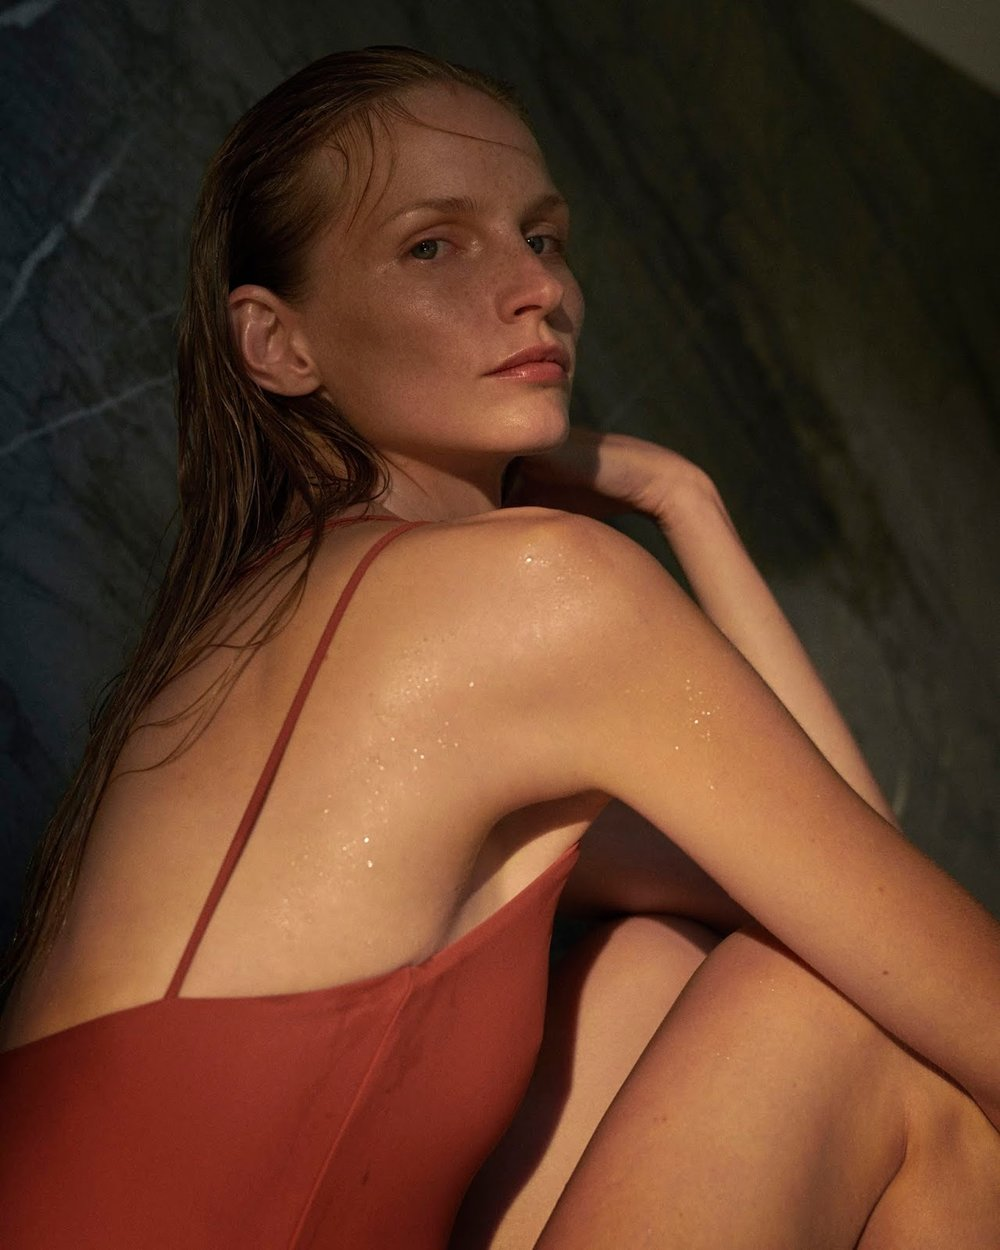 Katrin Thormann by Tobias Lundkvist for ELLE Germany (6).jpg